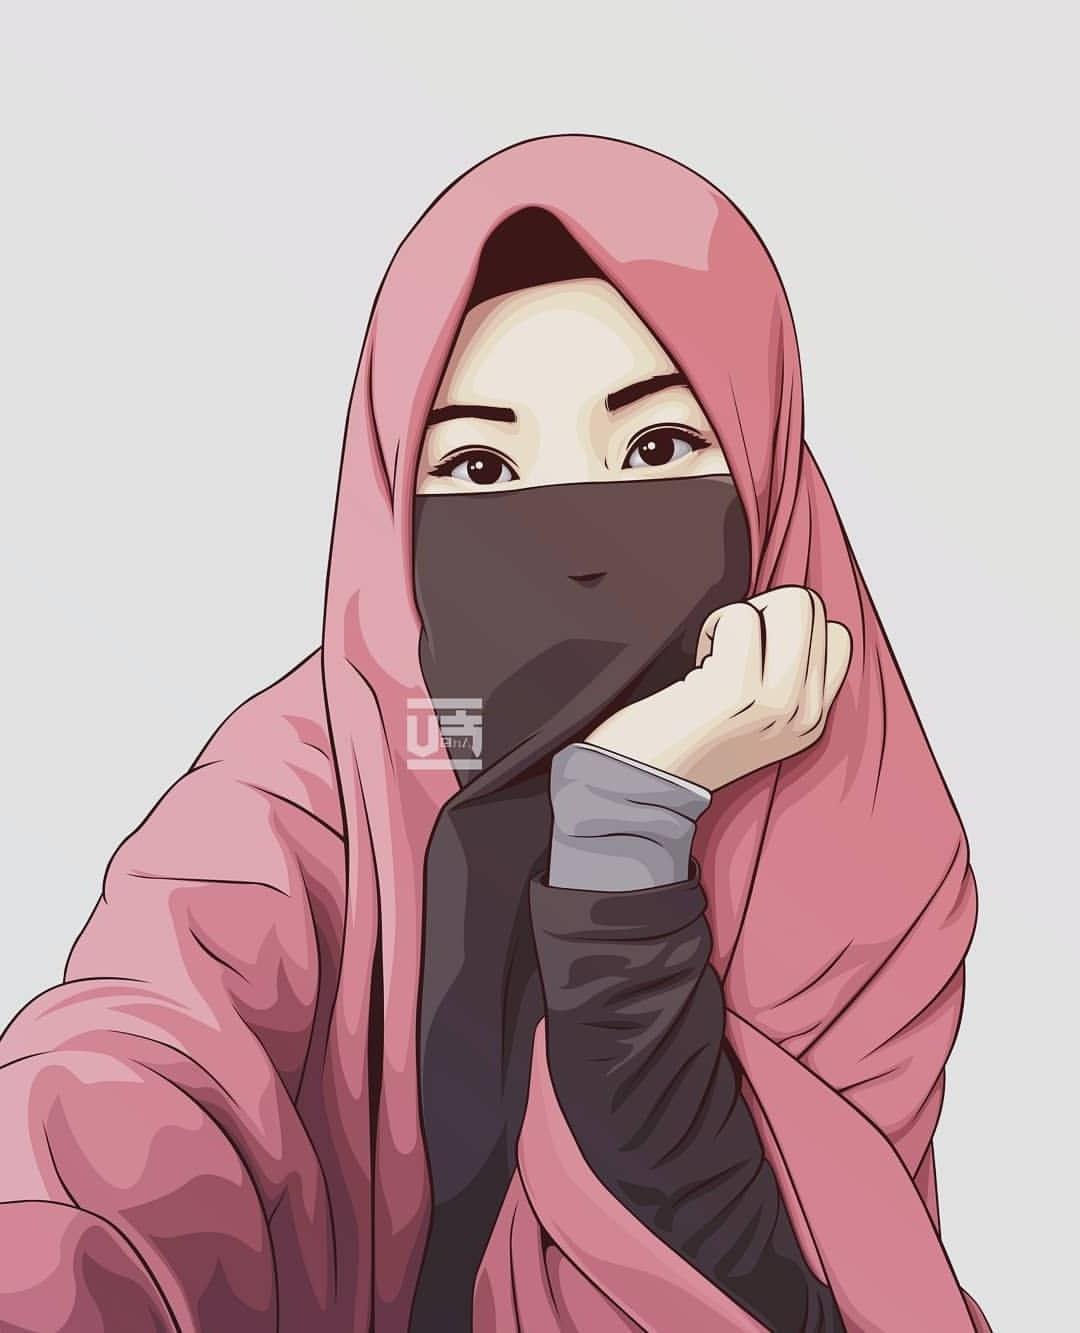 Design Muslimah Kartun S1du 1000 Gambar Kartun Muslimah Cantik Bercadar Kacamata El